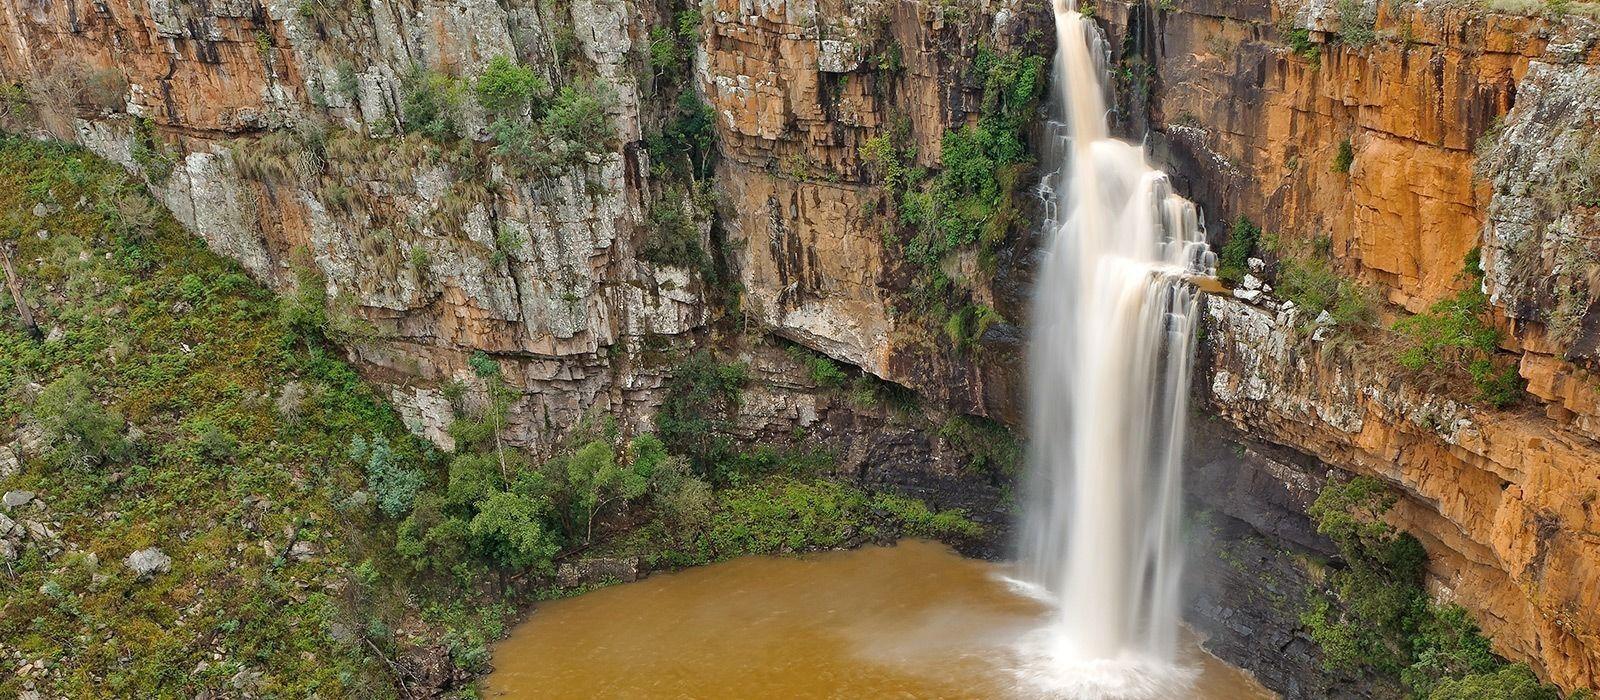 Destination Hazyview South Africa